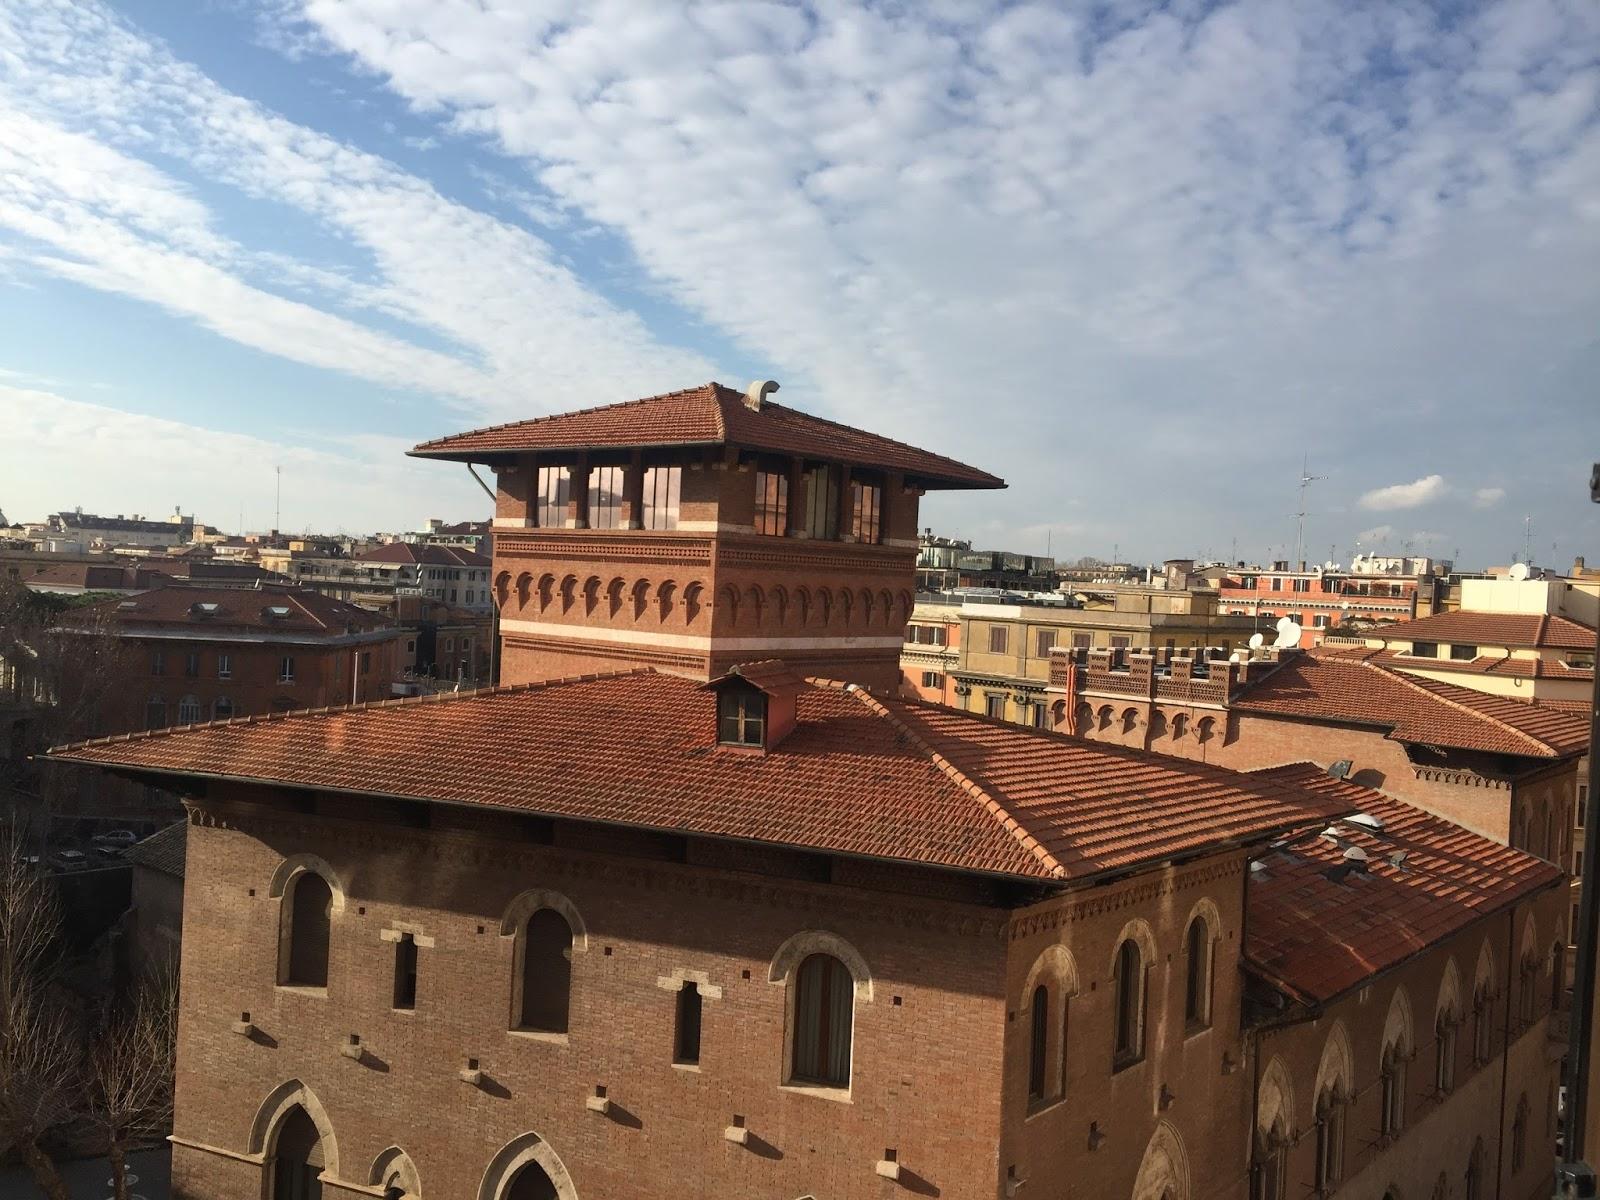 The Travel Gazette: UN WEEKEND NELL\'ETERNA ROMA IN UN HOTEL SIMBOLO ...